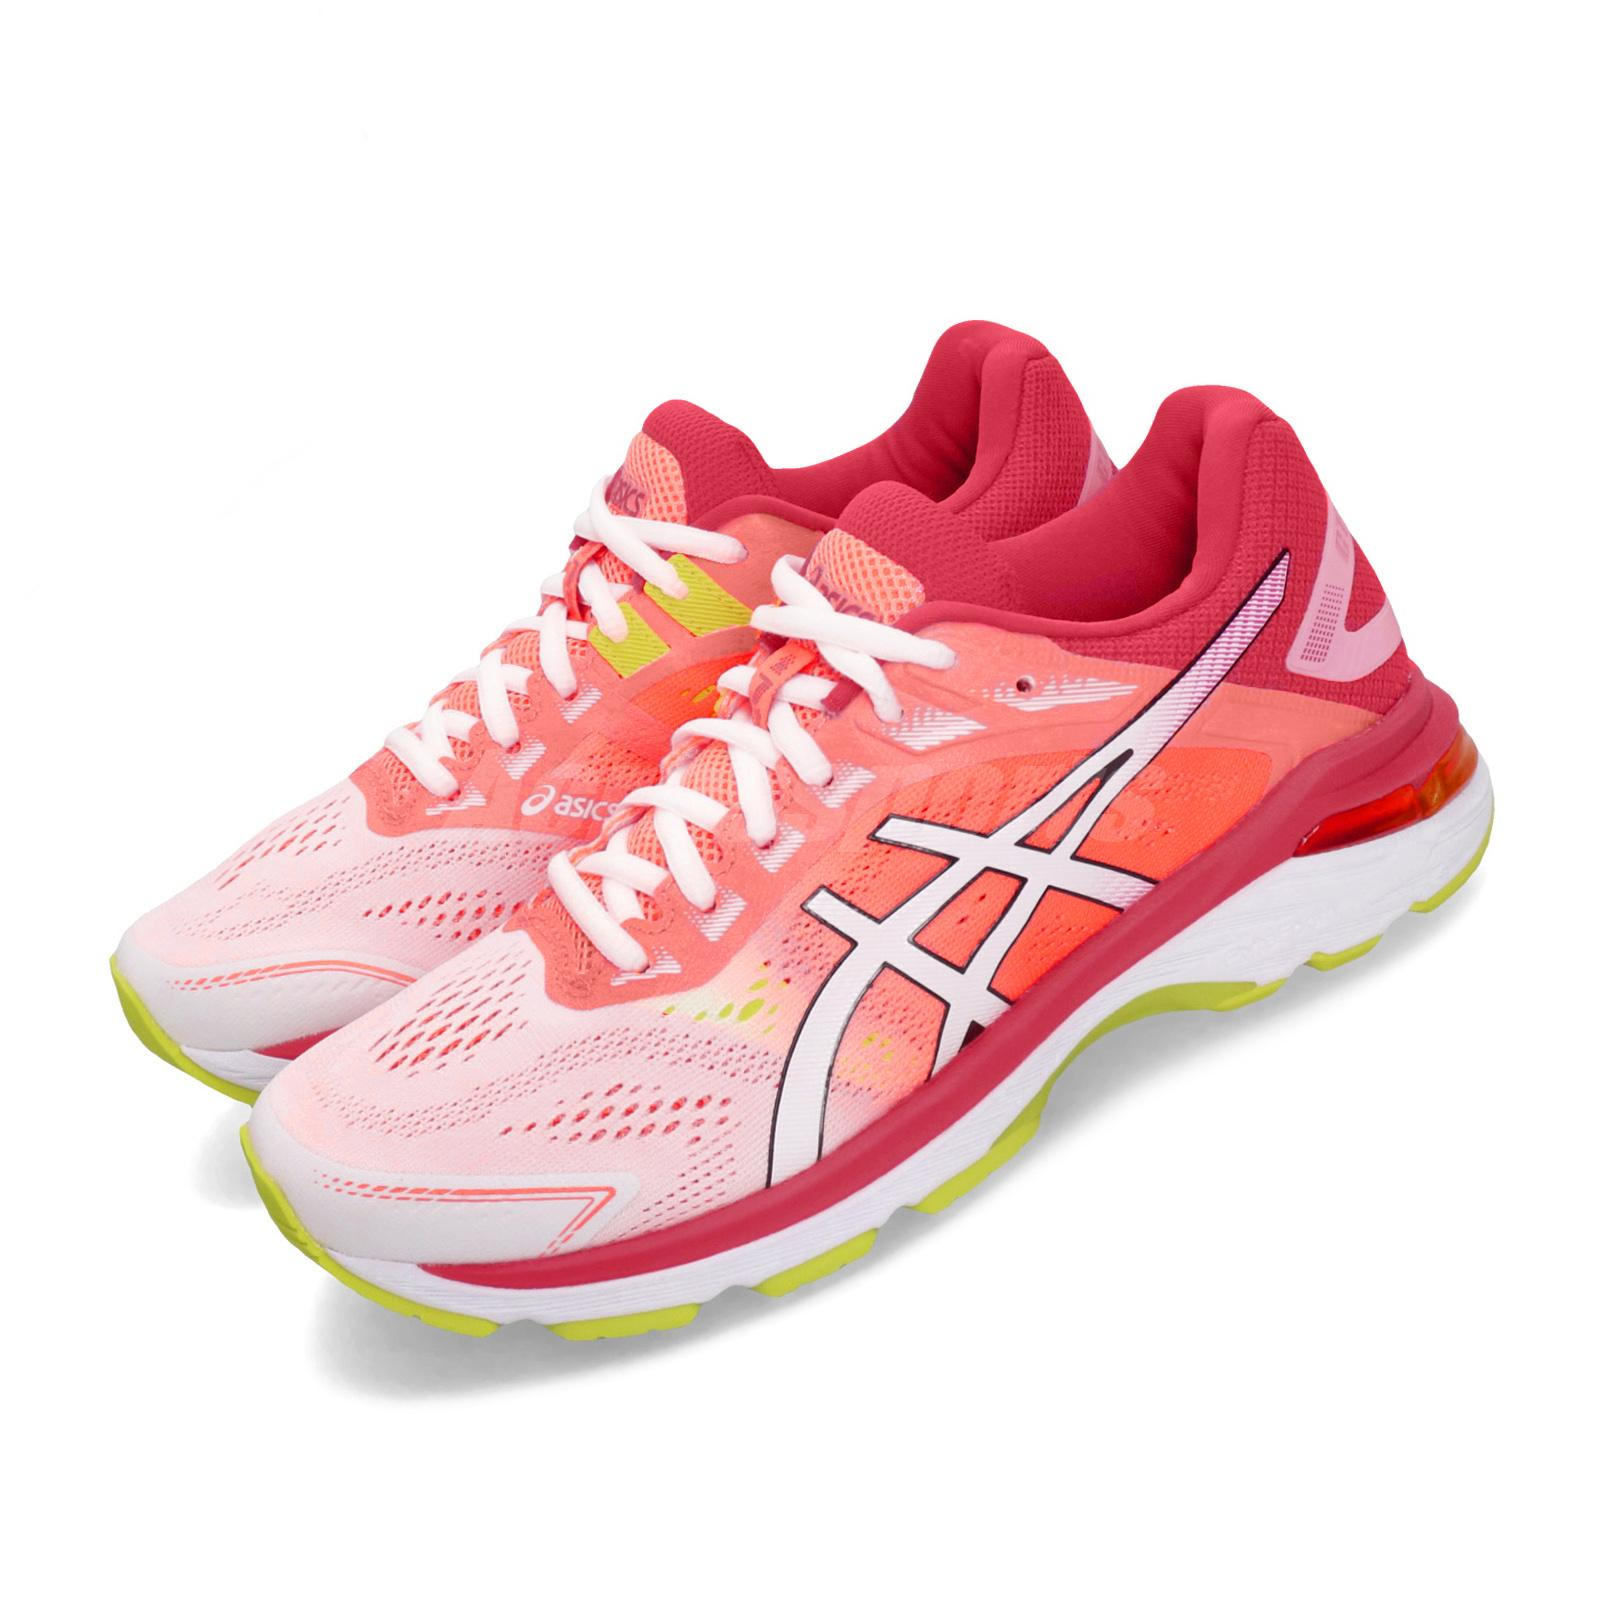 Details about Asics GT 2000 7 White Laser Pink Orange Women Running Shoes Sneaker 1012A610 100